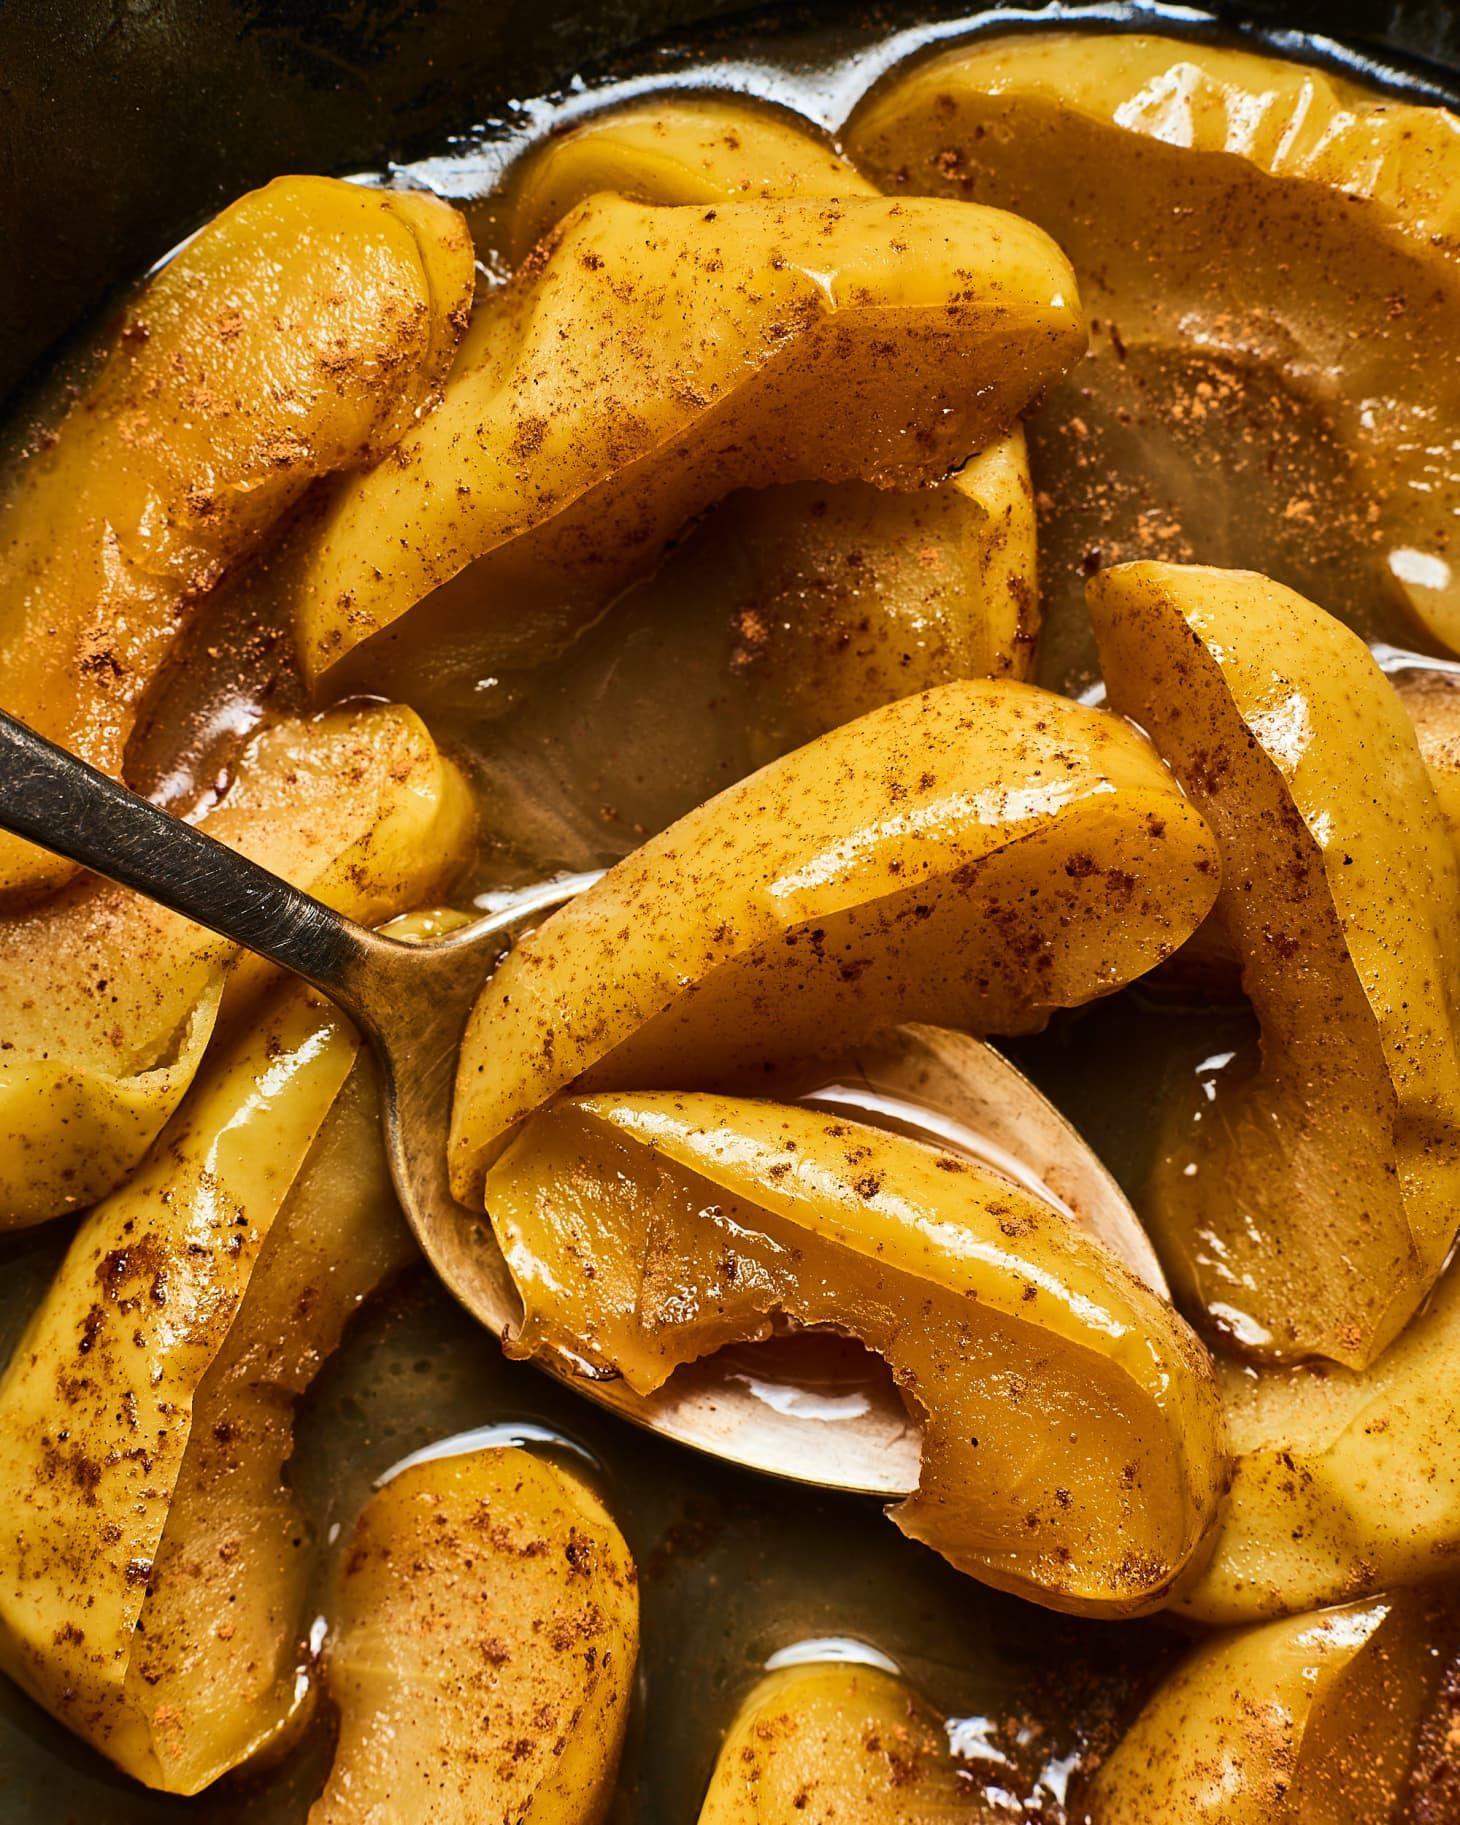 BetterThanCrackerBarrel Skillet Fried Apples Recipe